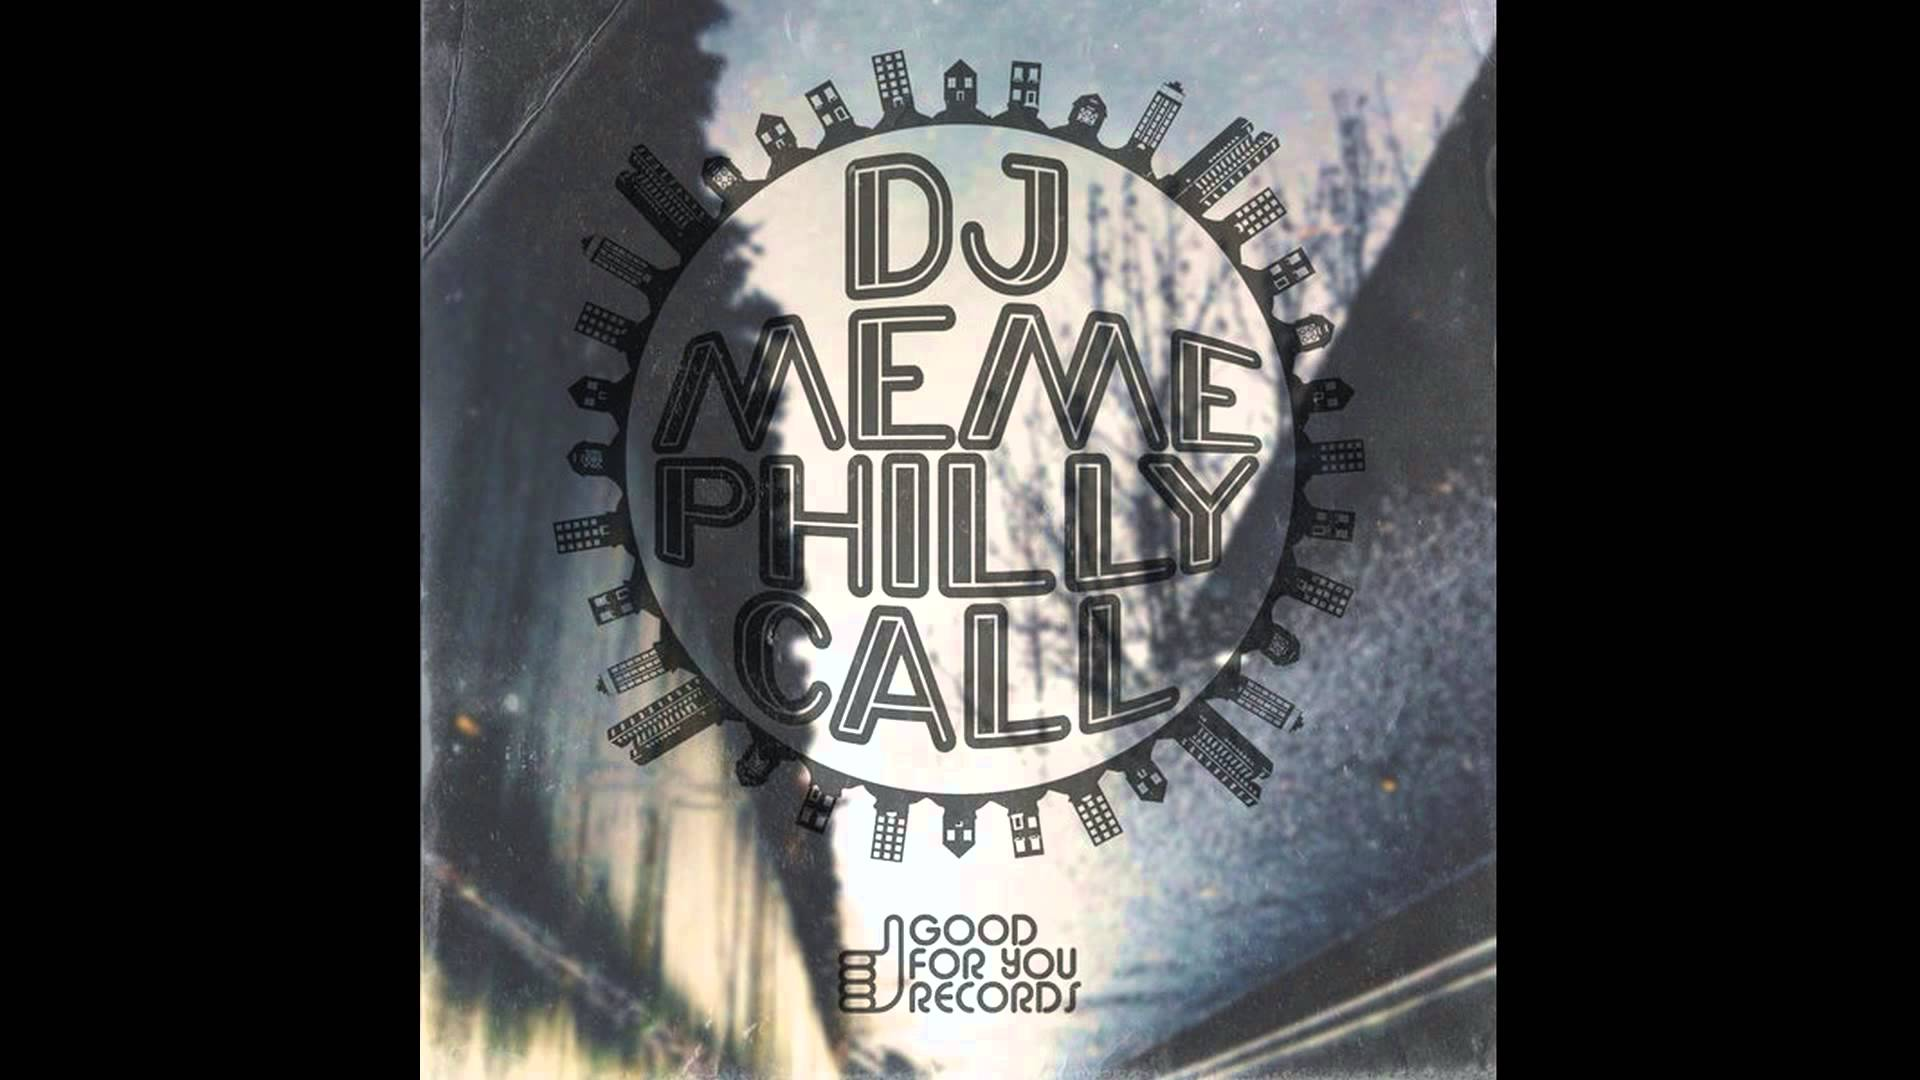 Art for Philly Soul (Original Mix) by DJ Meme